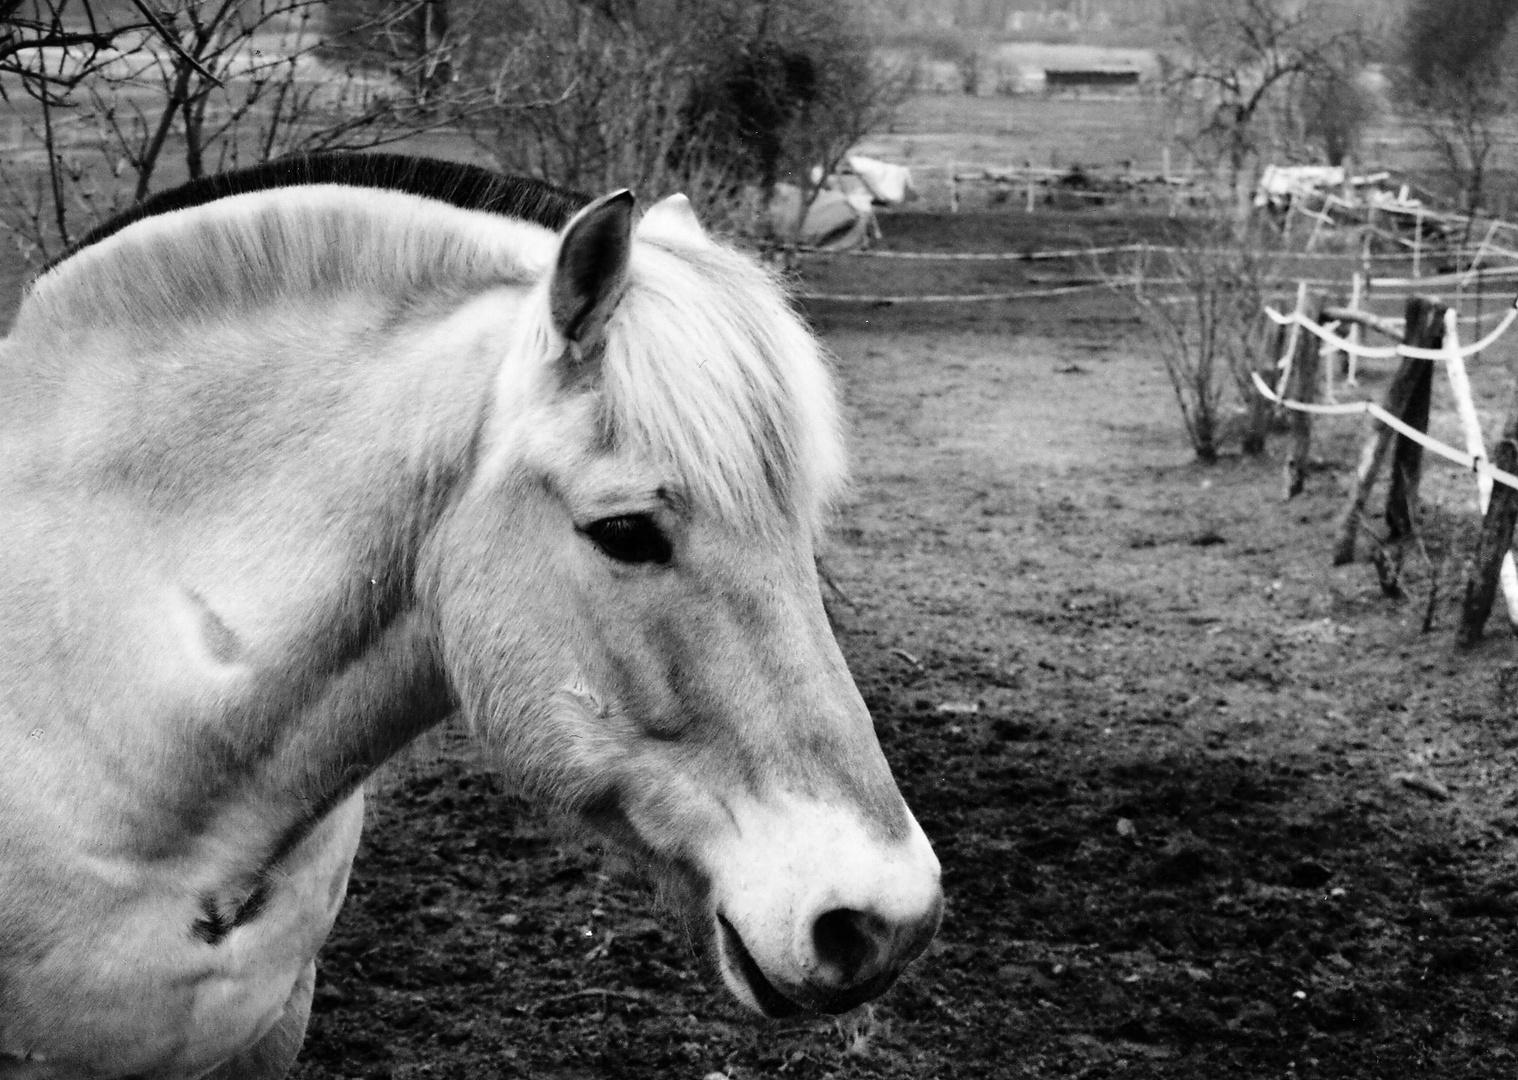 Goodbye horses, I'm flying over you